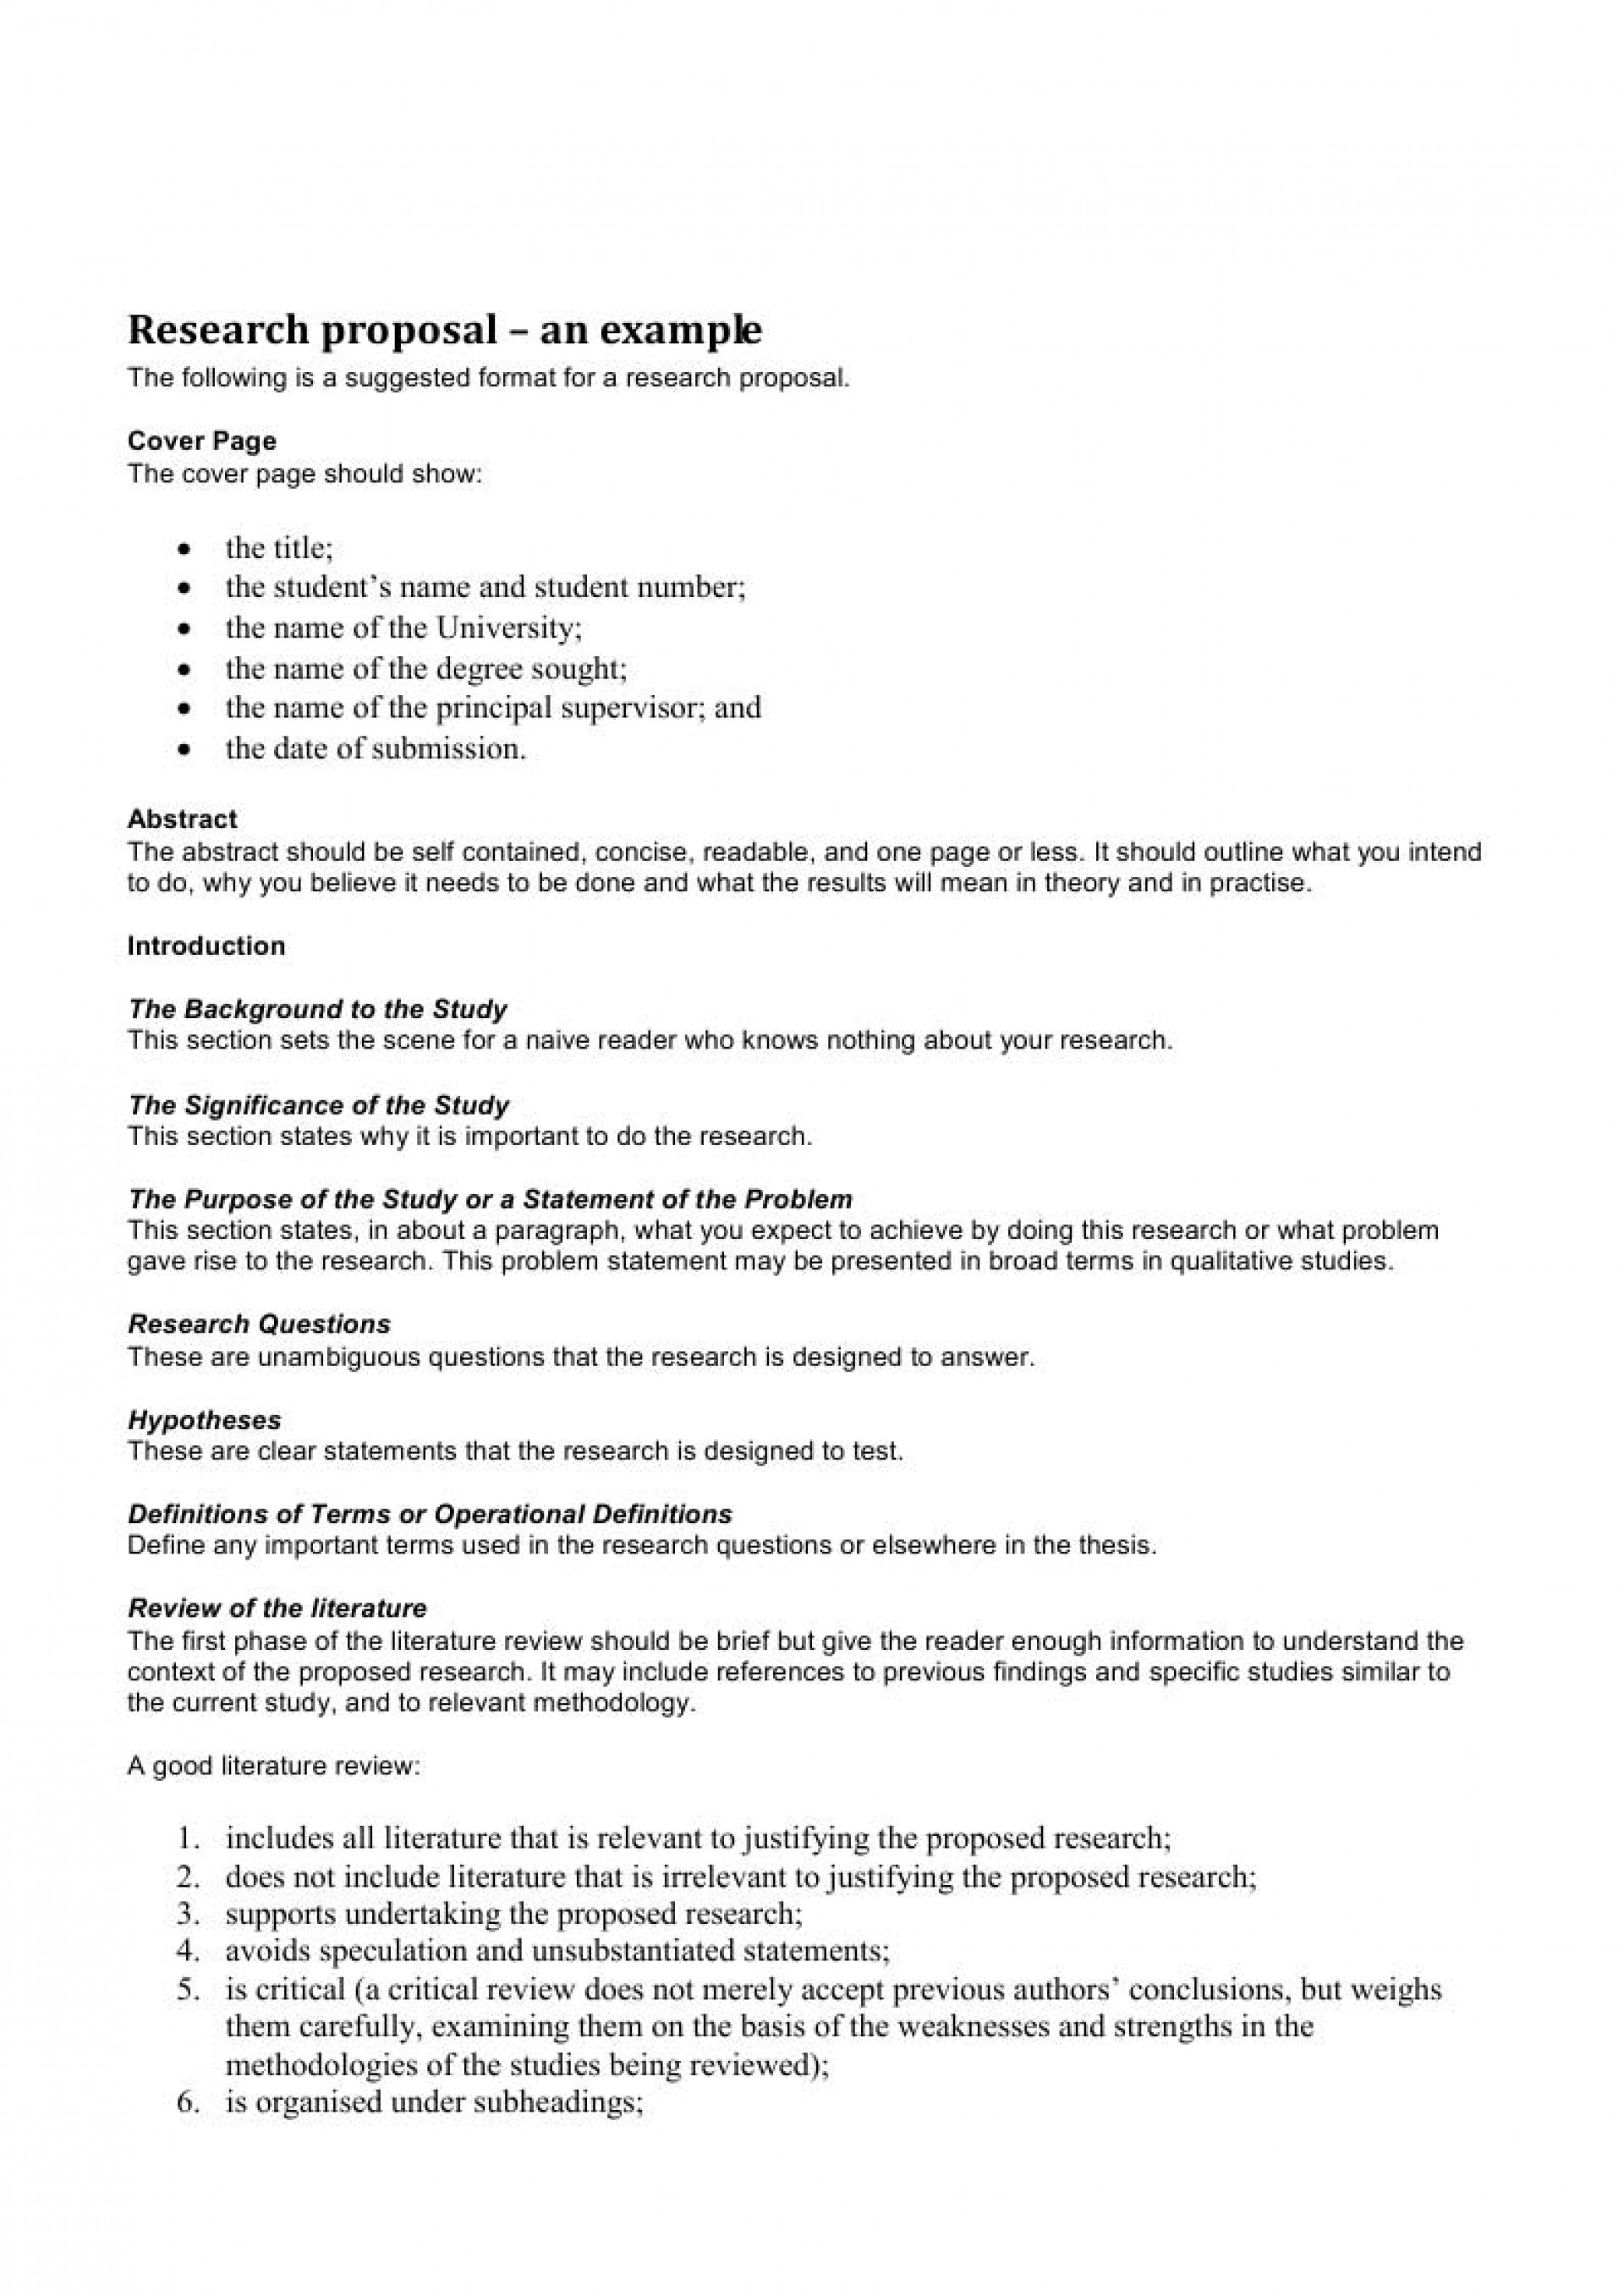 004 Essay Example Lemon Clot Research Proposal Unusual Reddit 1920